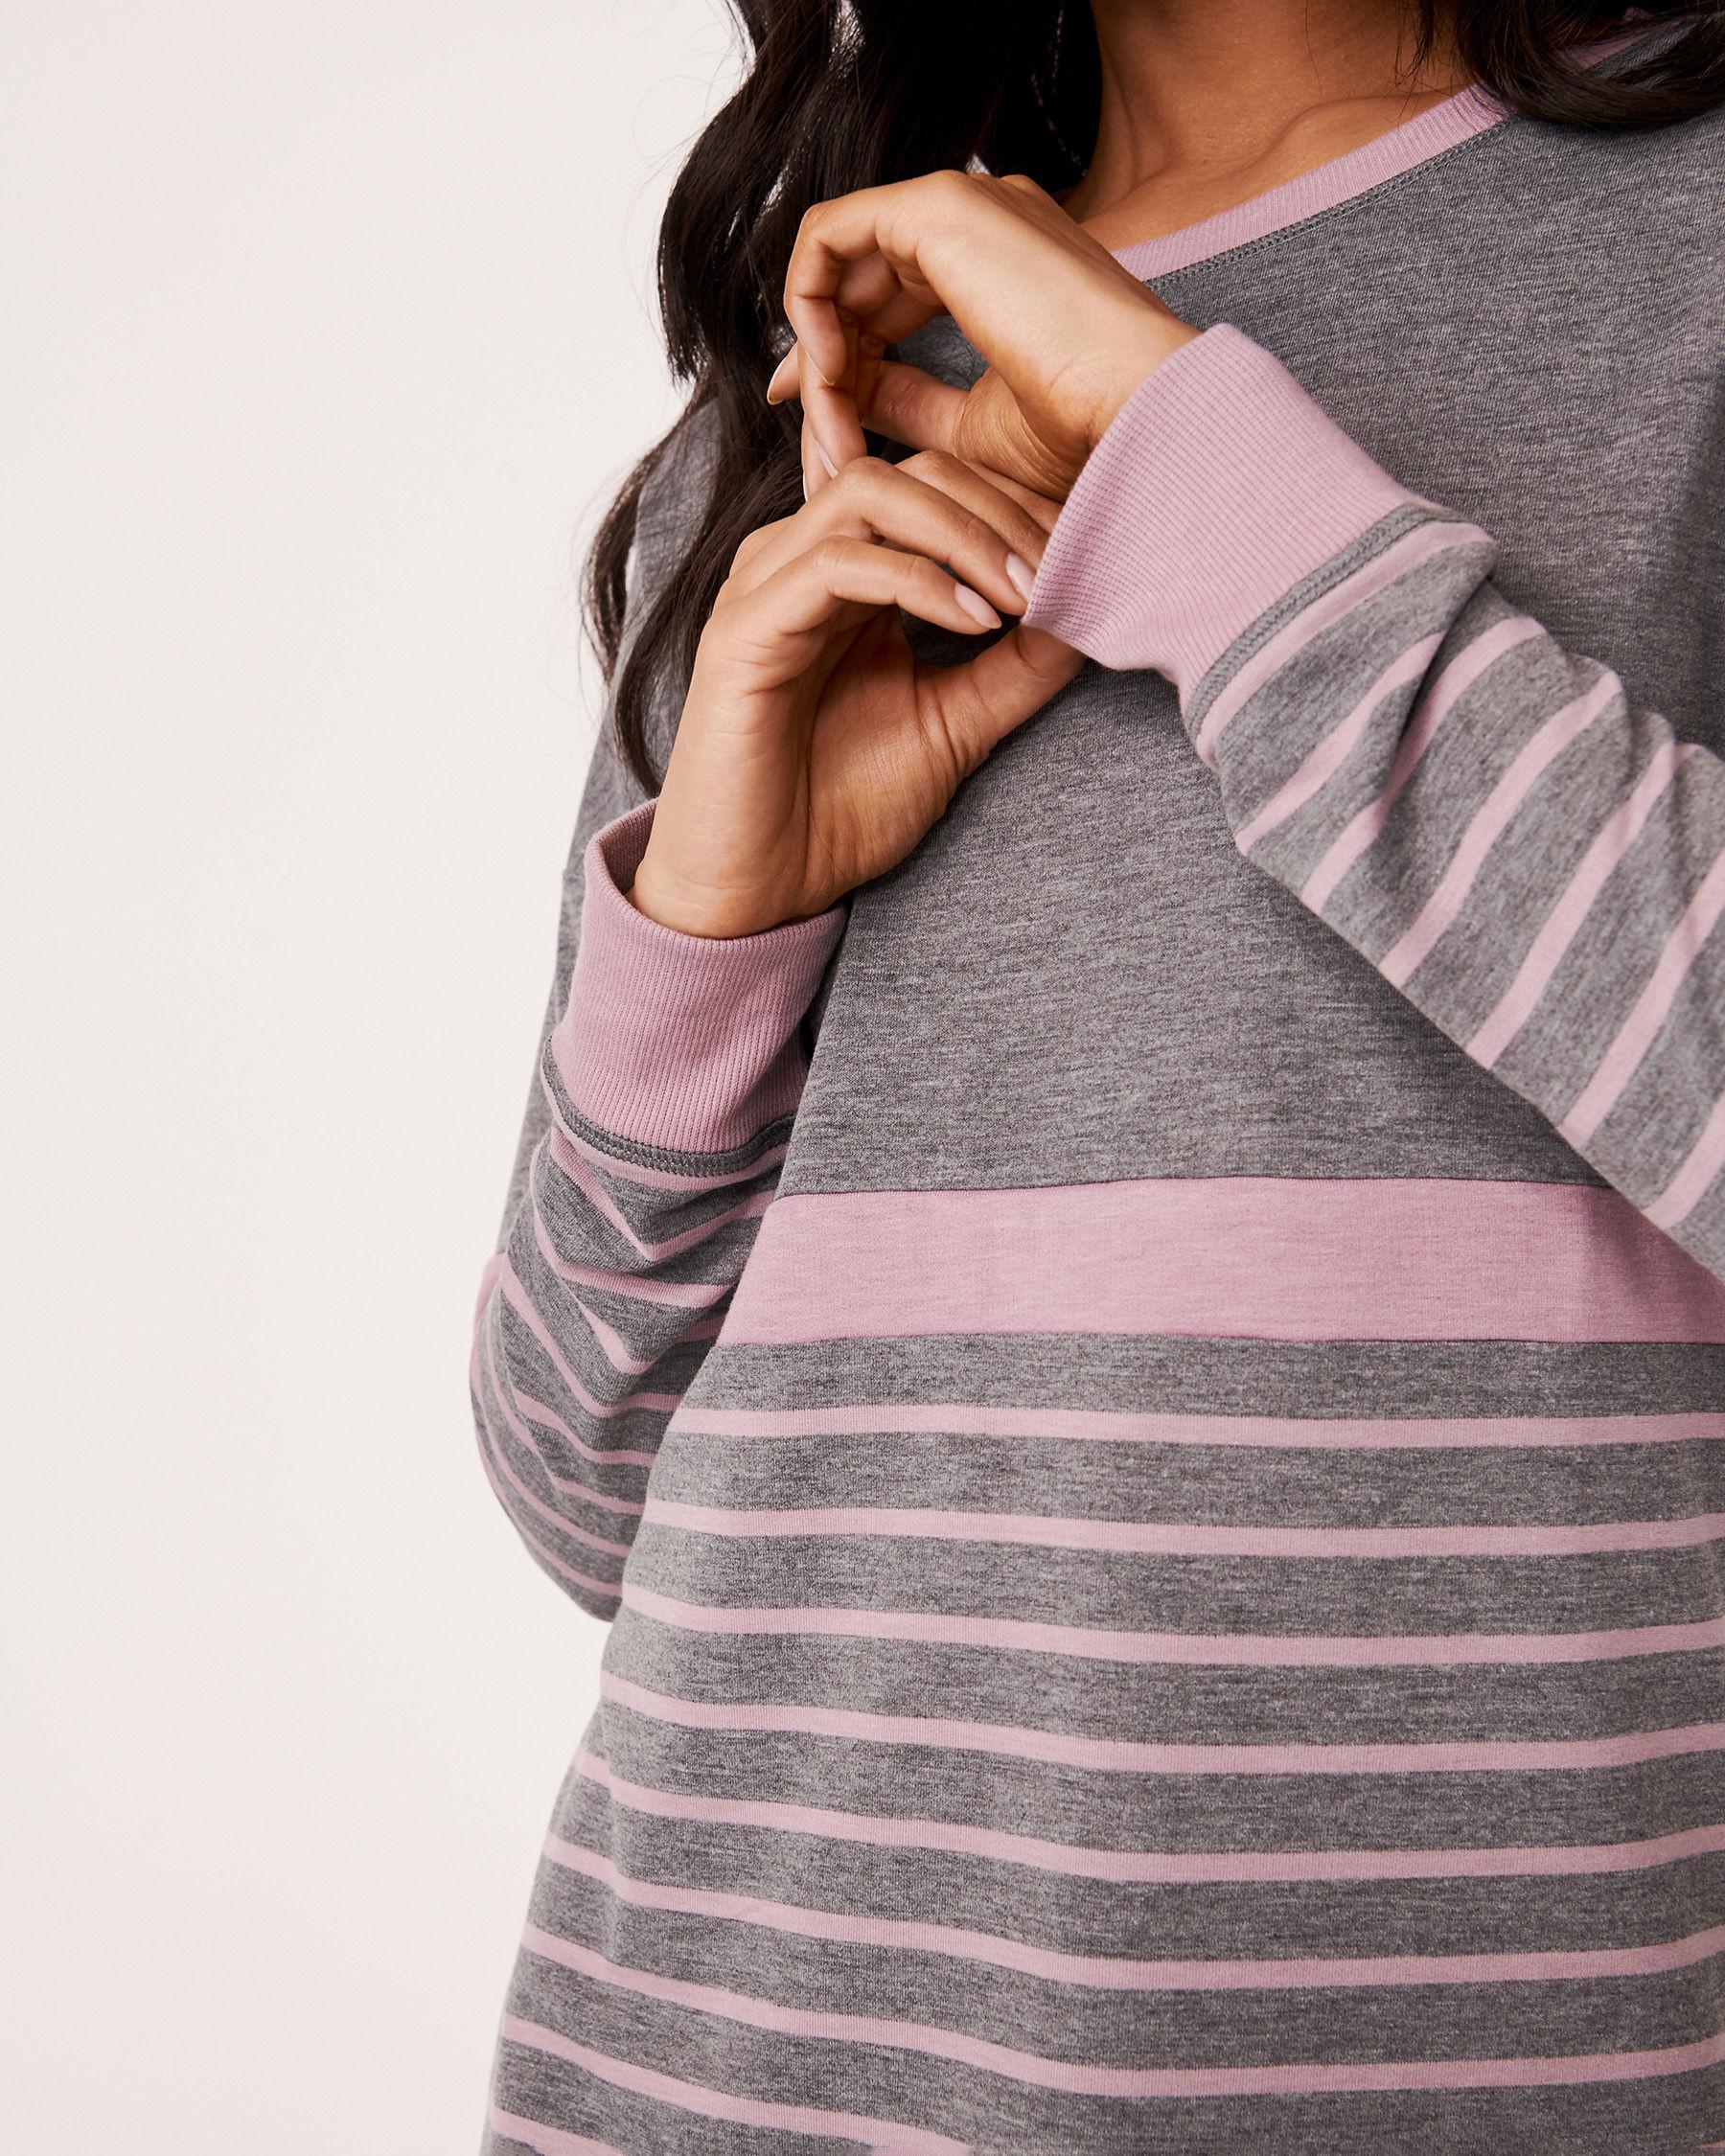 LA VIE EN ROSE Long Sleeve Striped Dress Grey and pink mix 768-374-0-11 - View3